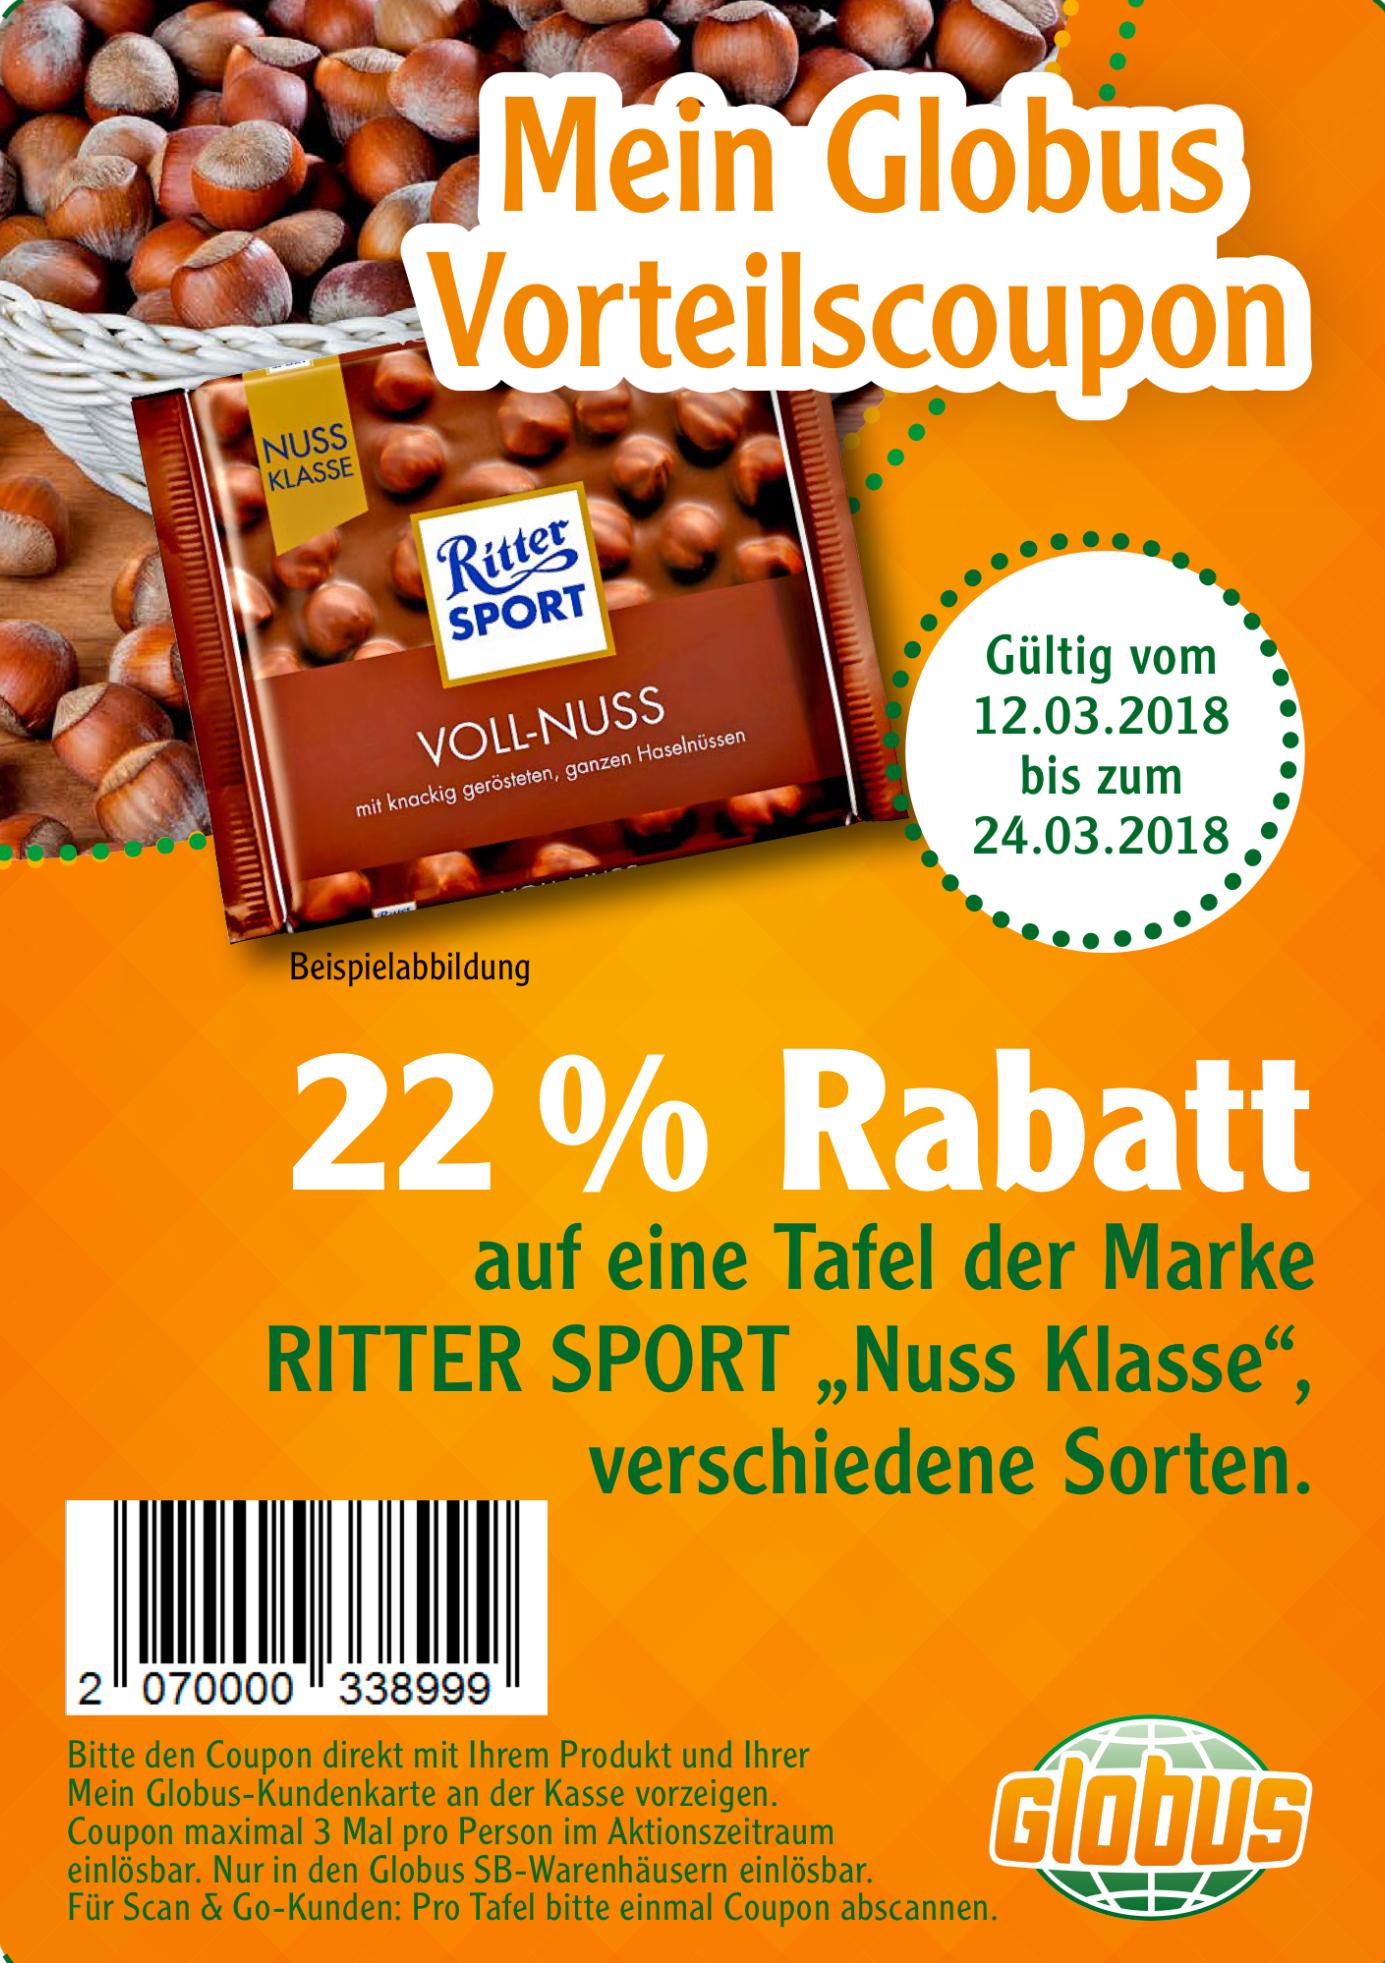 Globus Kundenkarte: 22% Rabatt auf Ritter Sport Nussklasse